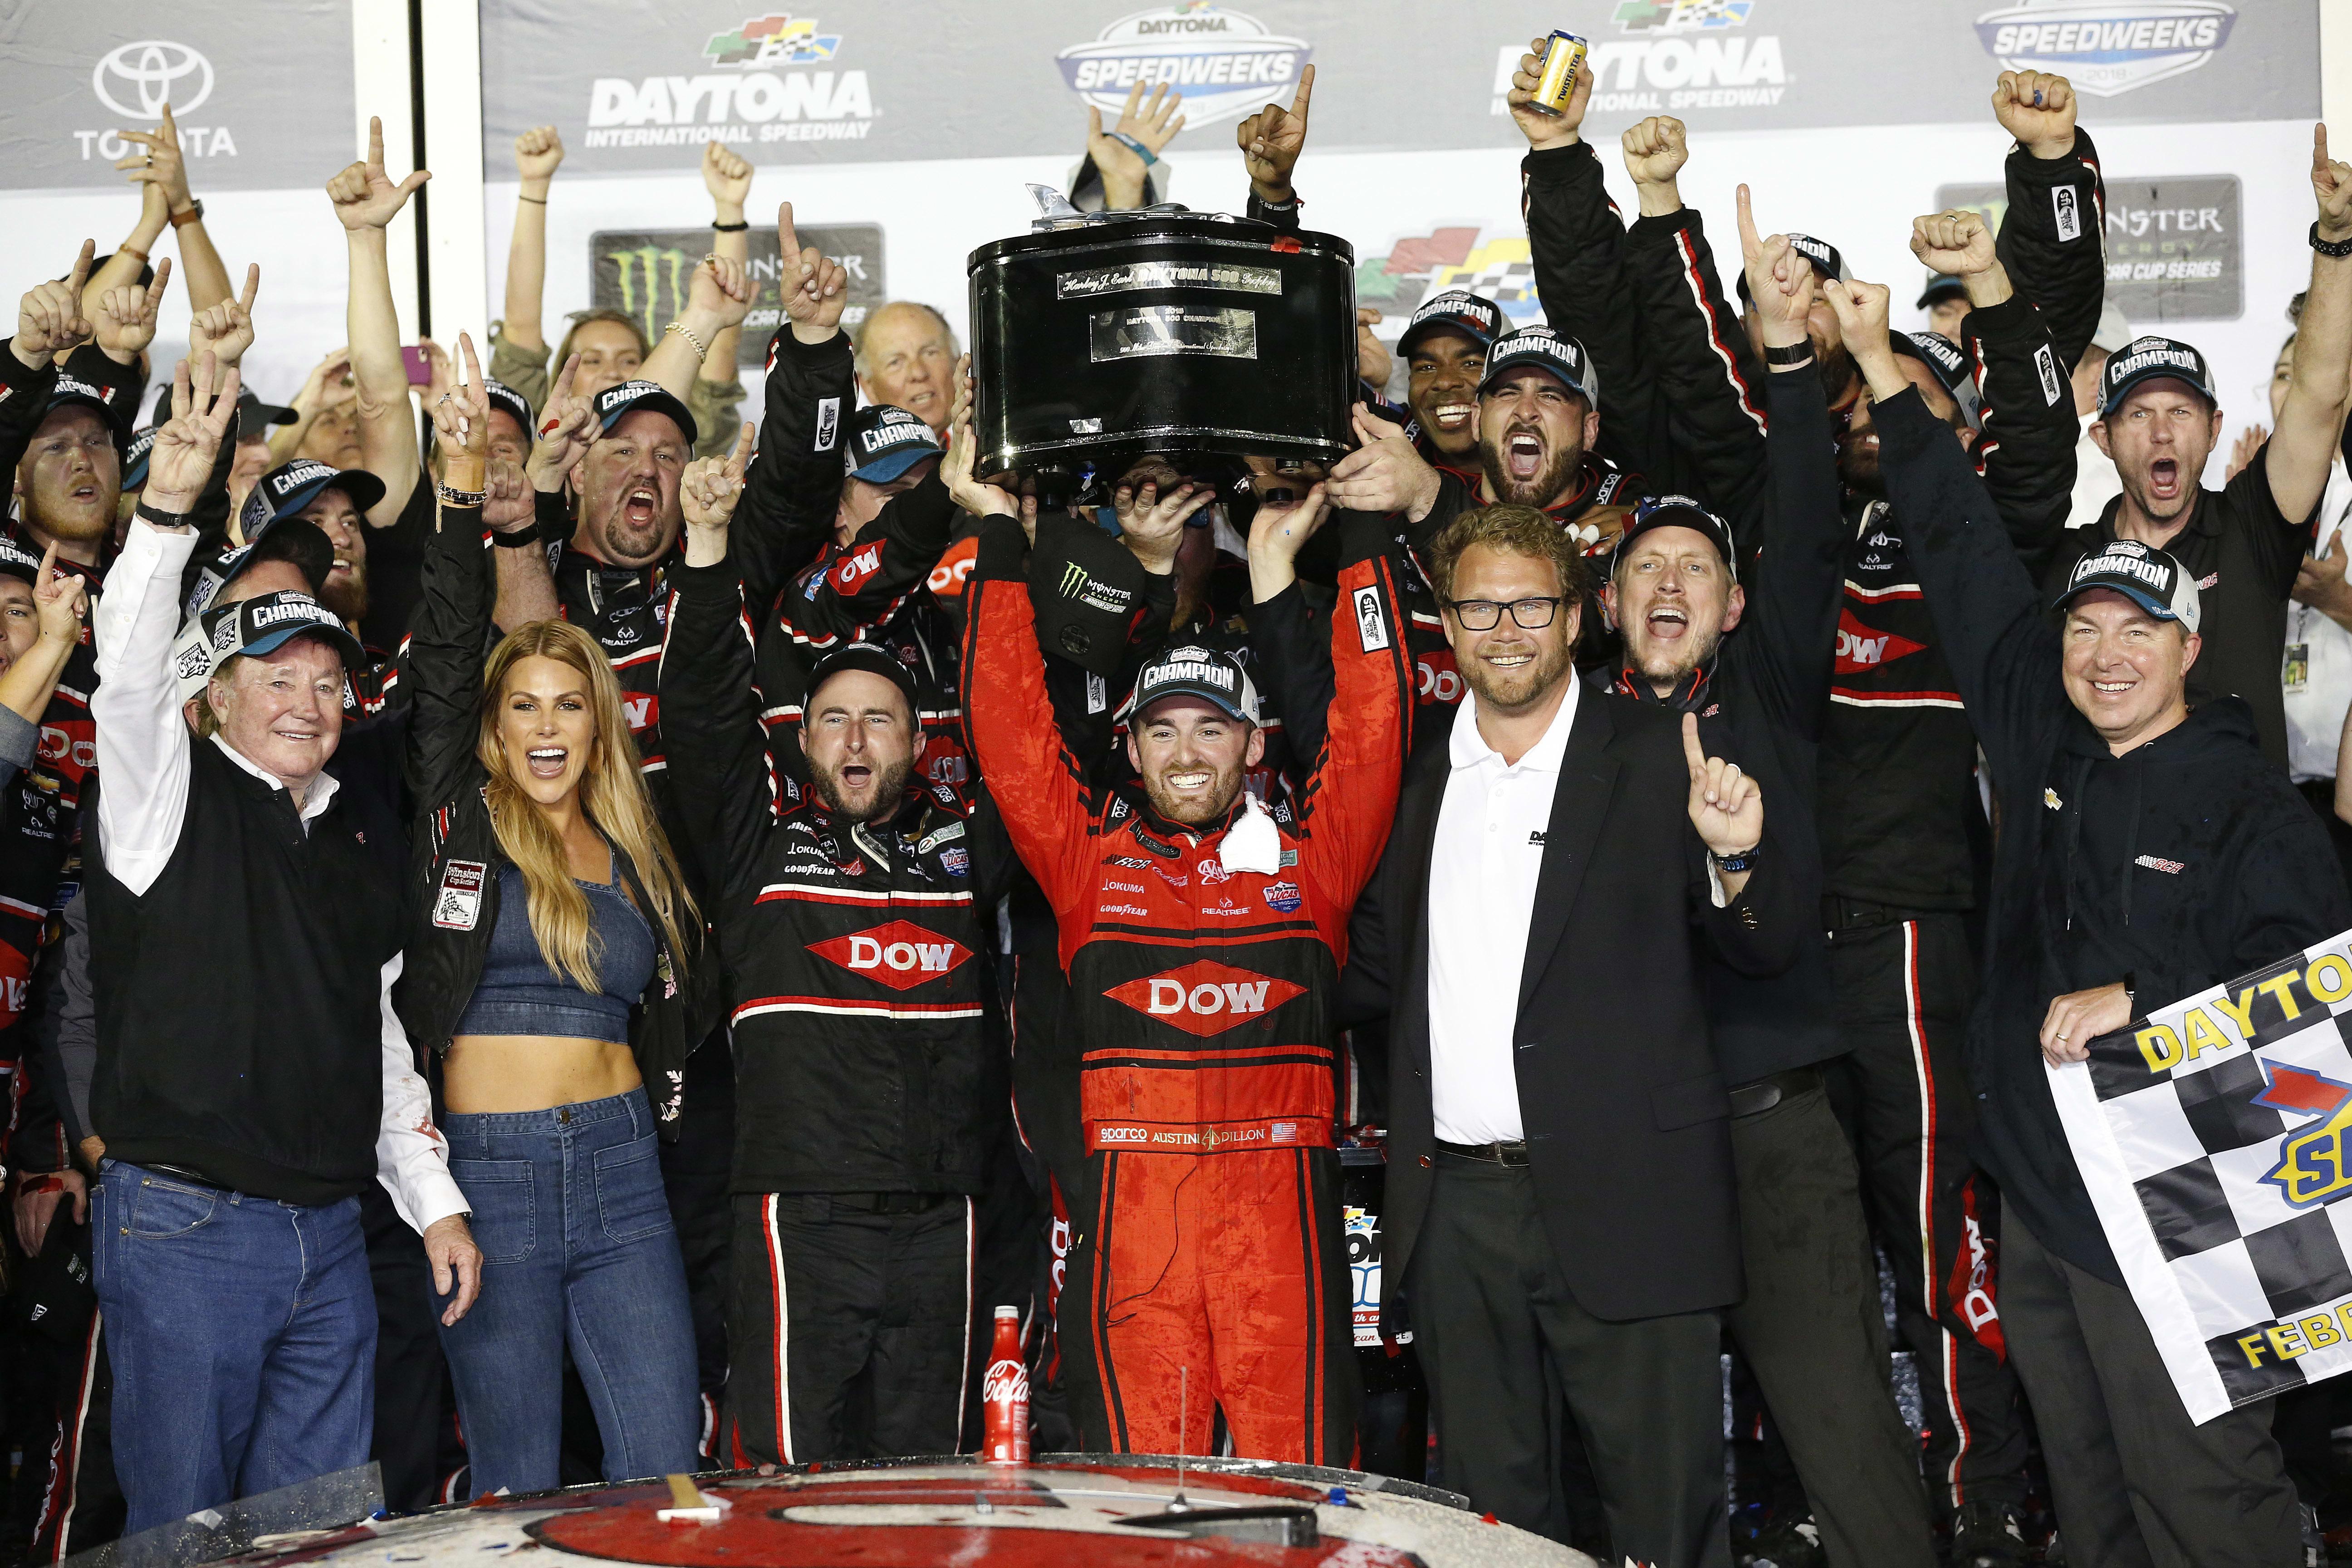 Austin Dillon raising the trophy.